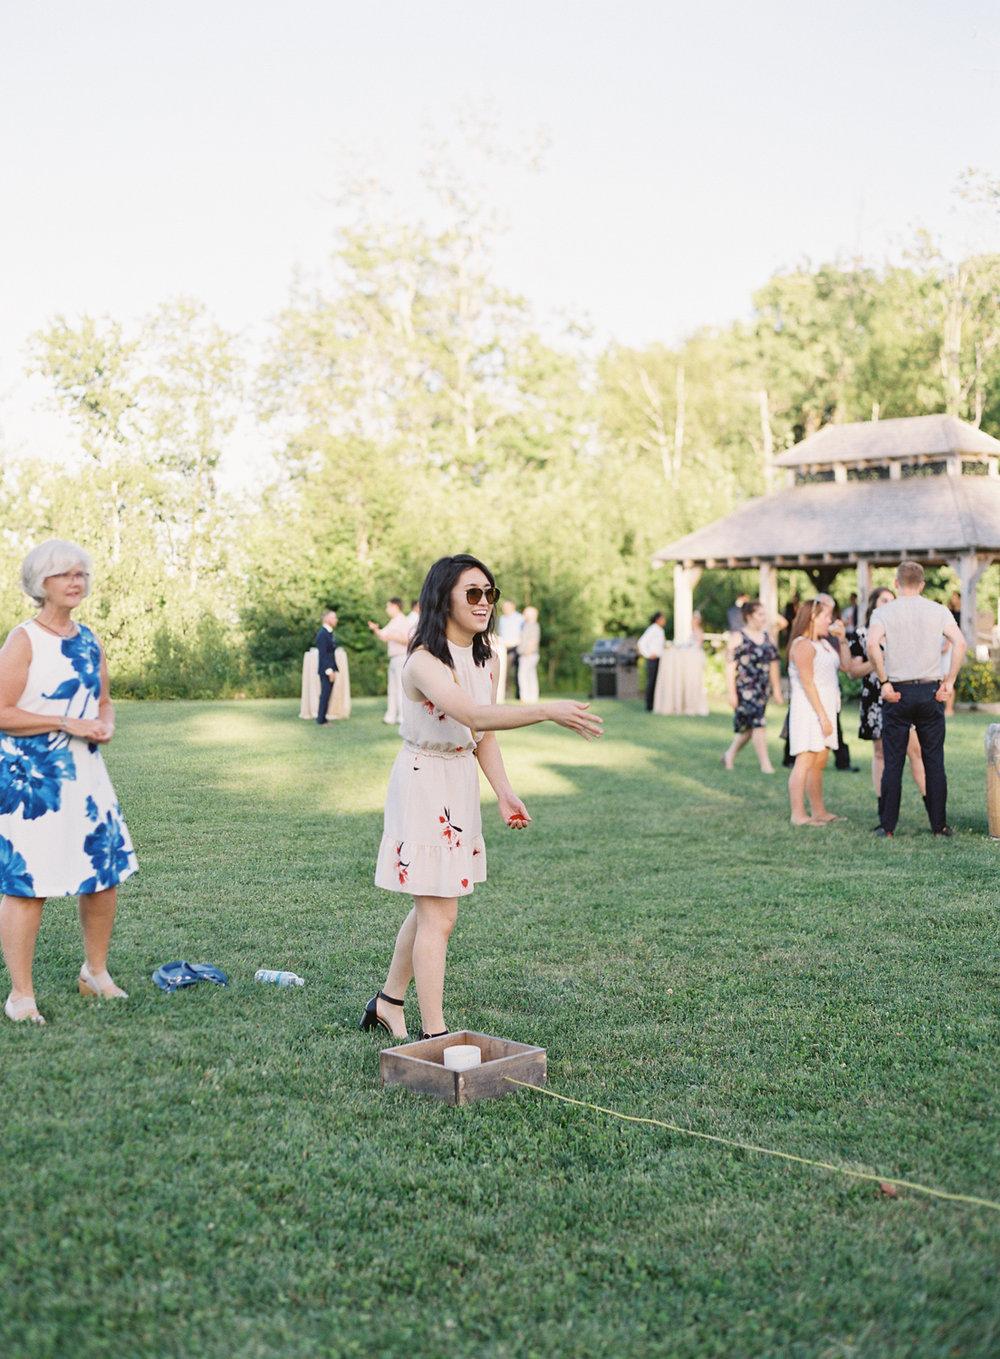 Jacqueline Anne Photography - Nova Scotia Backyard Wedding-61.jpg